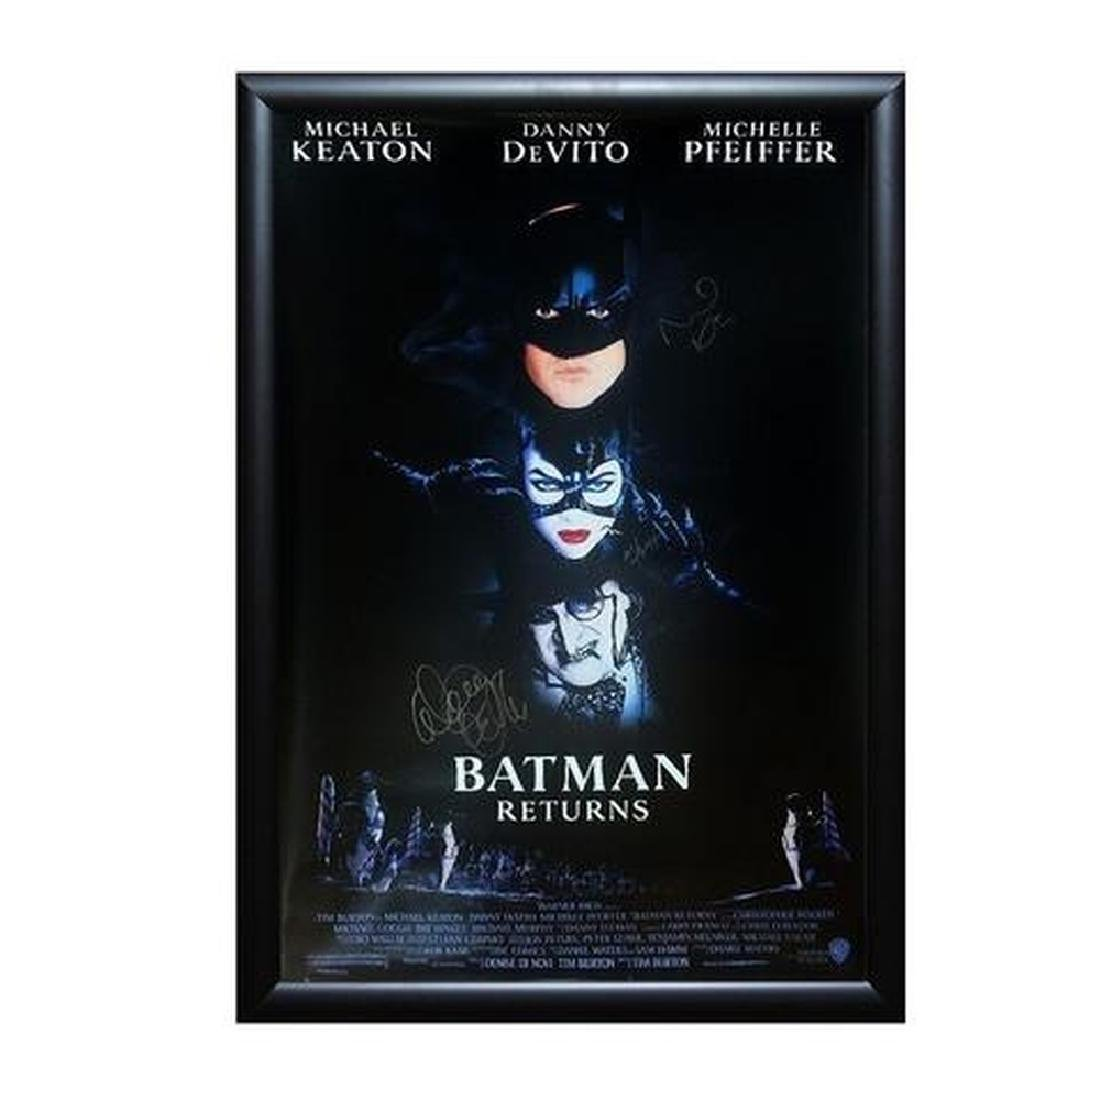 Batman Returns - Signed Movie Poster